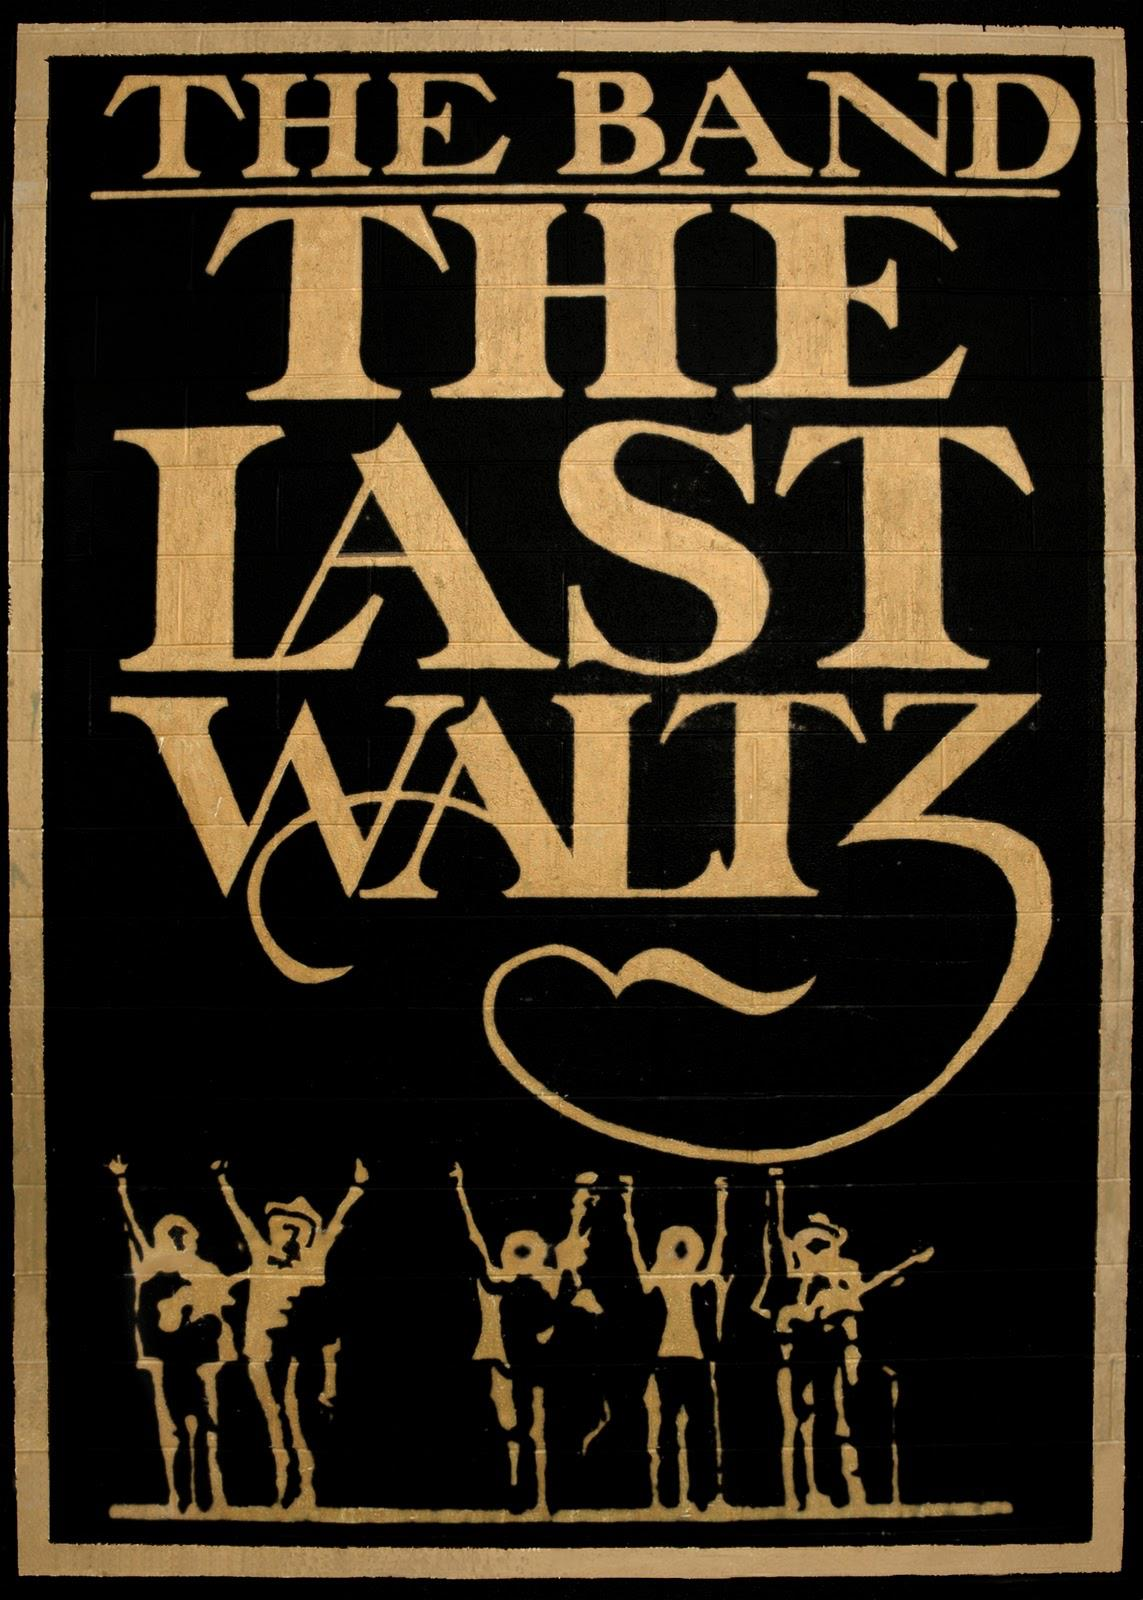 The-last-waltz-poster